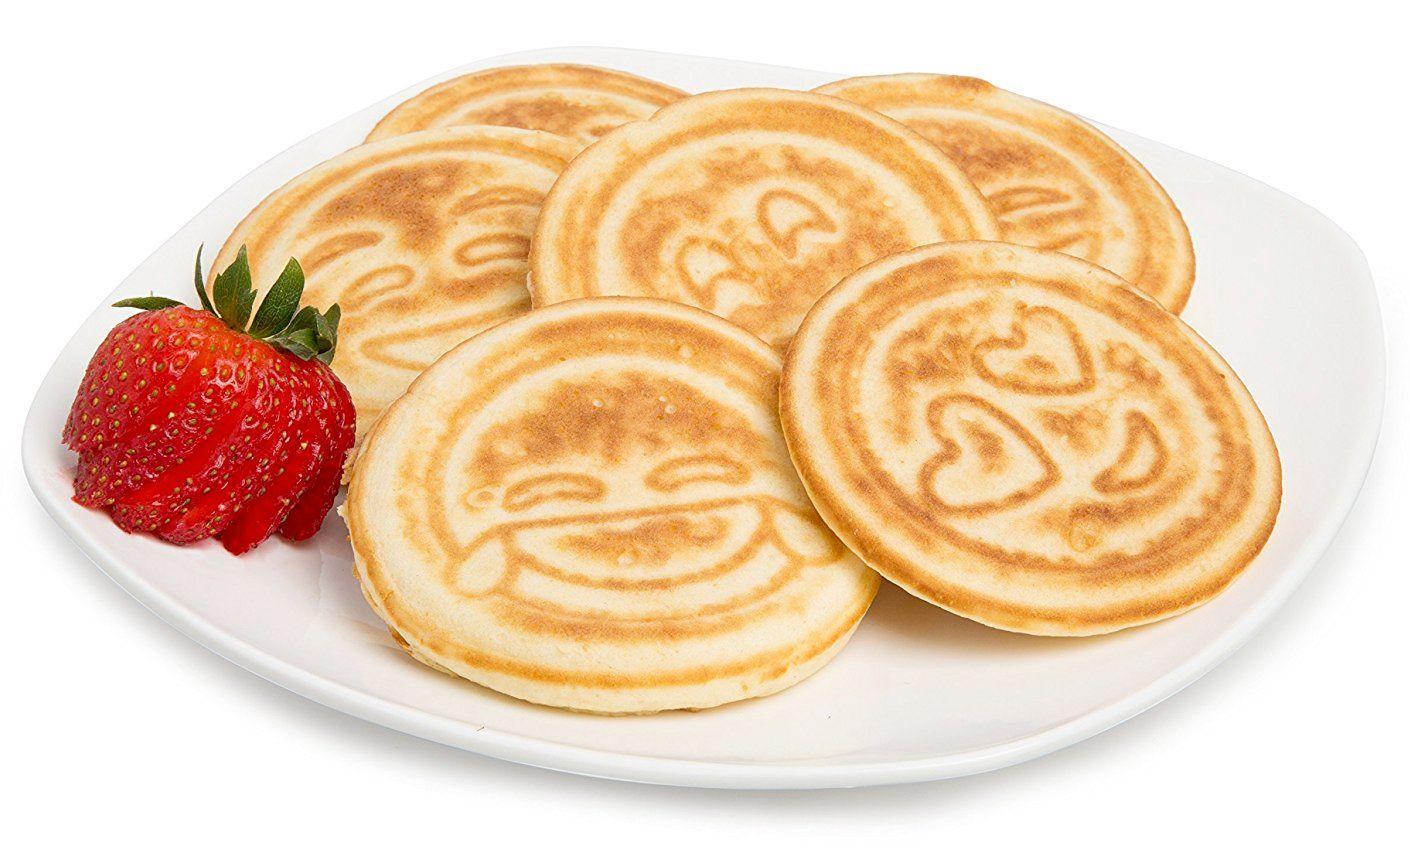 Frigideira-de-Panquecas-Emoji-Smiley-Face-Pancake-Pan-02